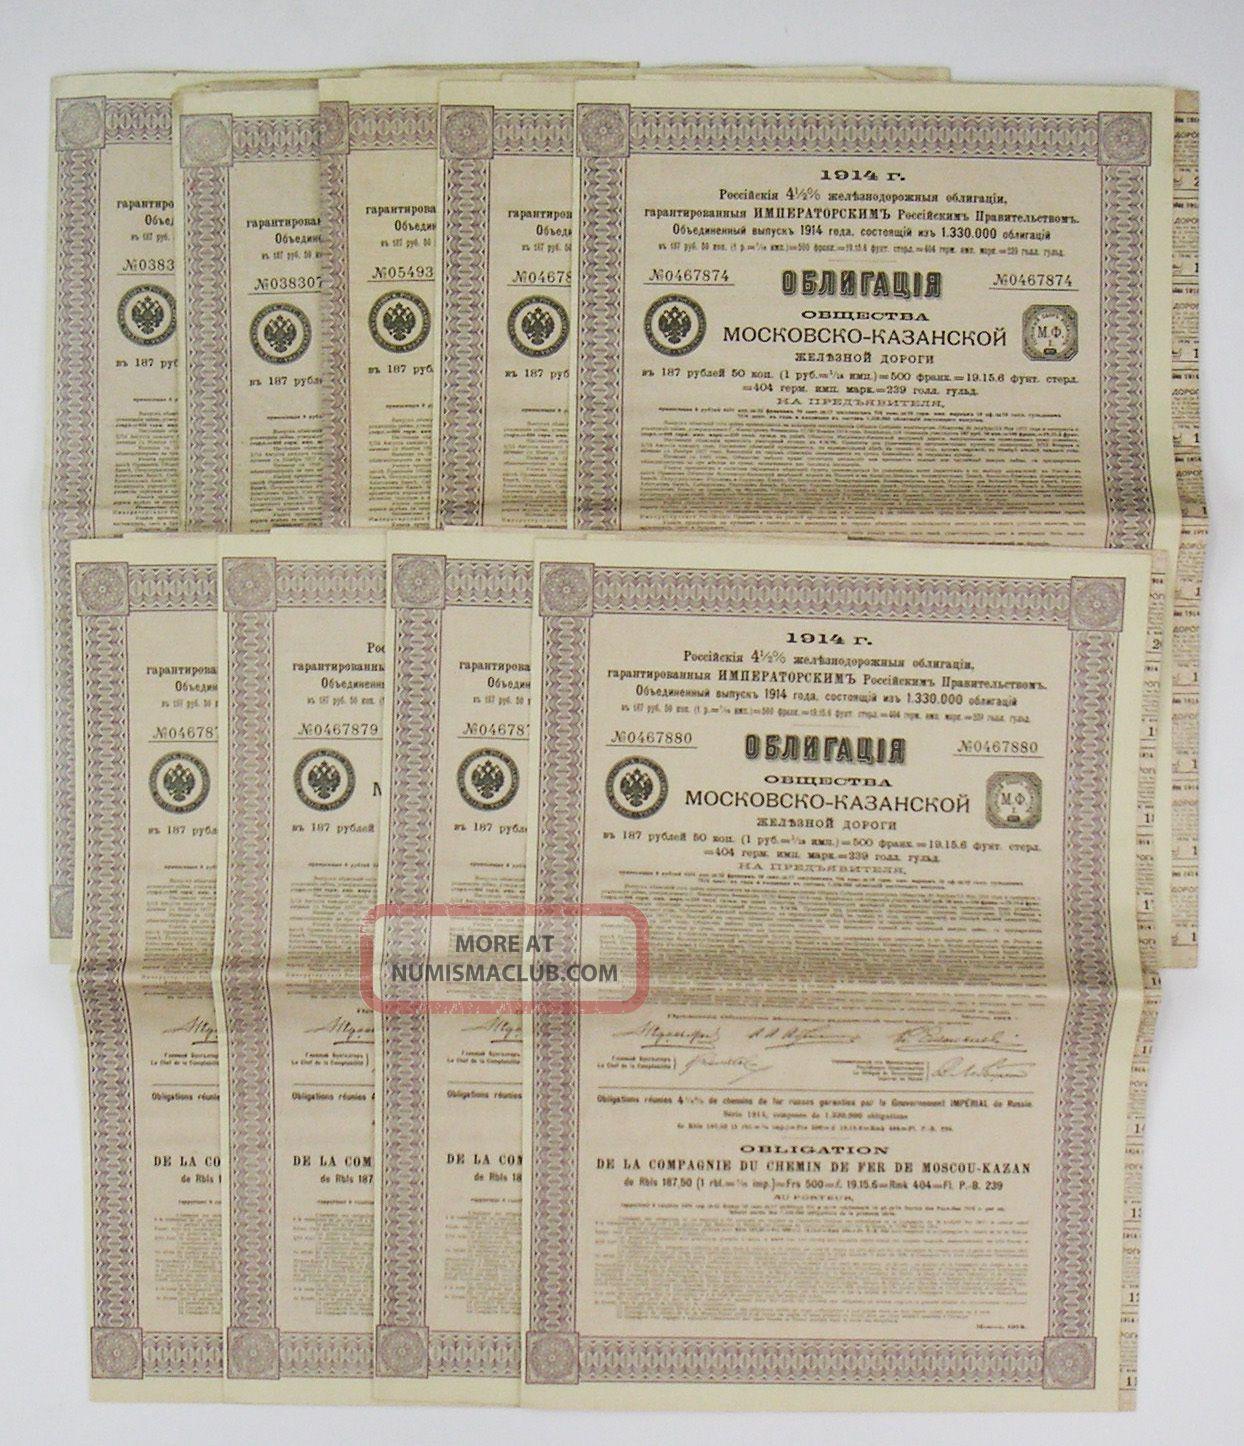 Russia 1914 - Imperial Government Railway Bond 4,  5 Moscou - Kazan 187,  50 Rbls X9 Stocks & Bonds, Scripophily photo